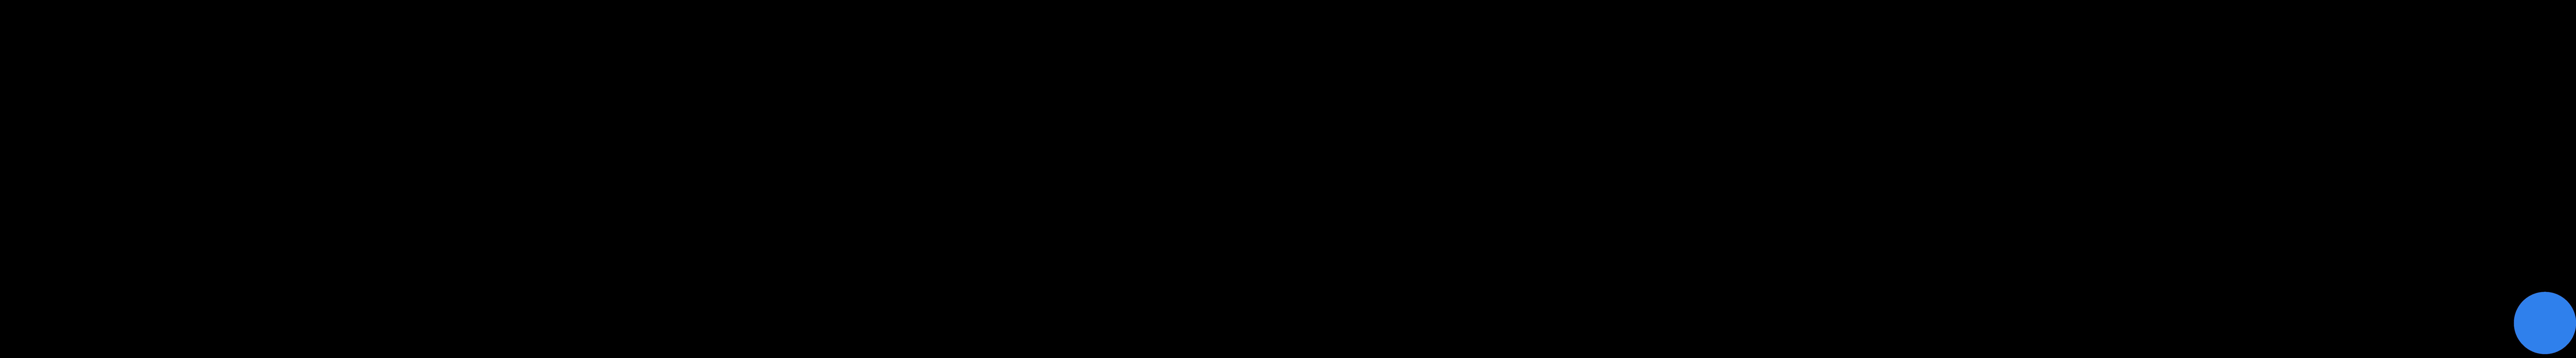 ScholarSite logo